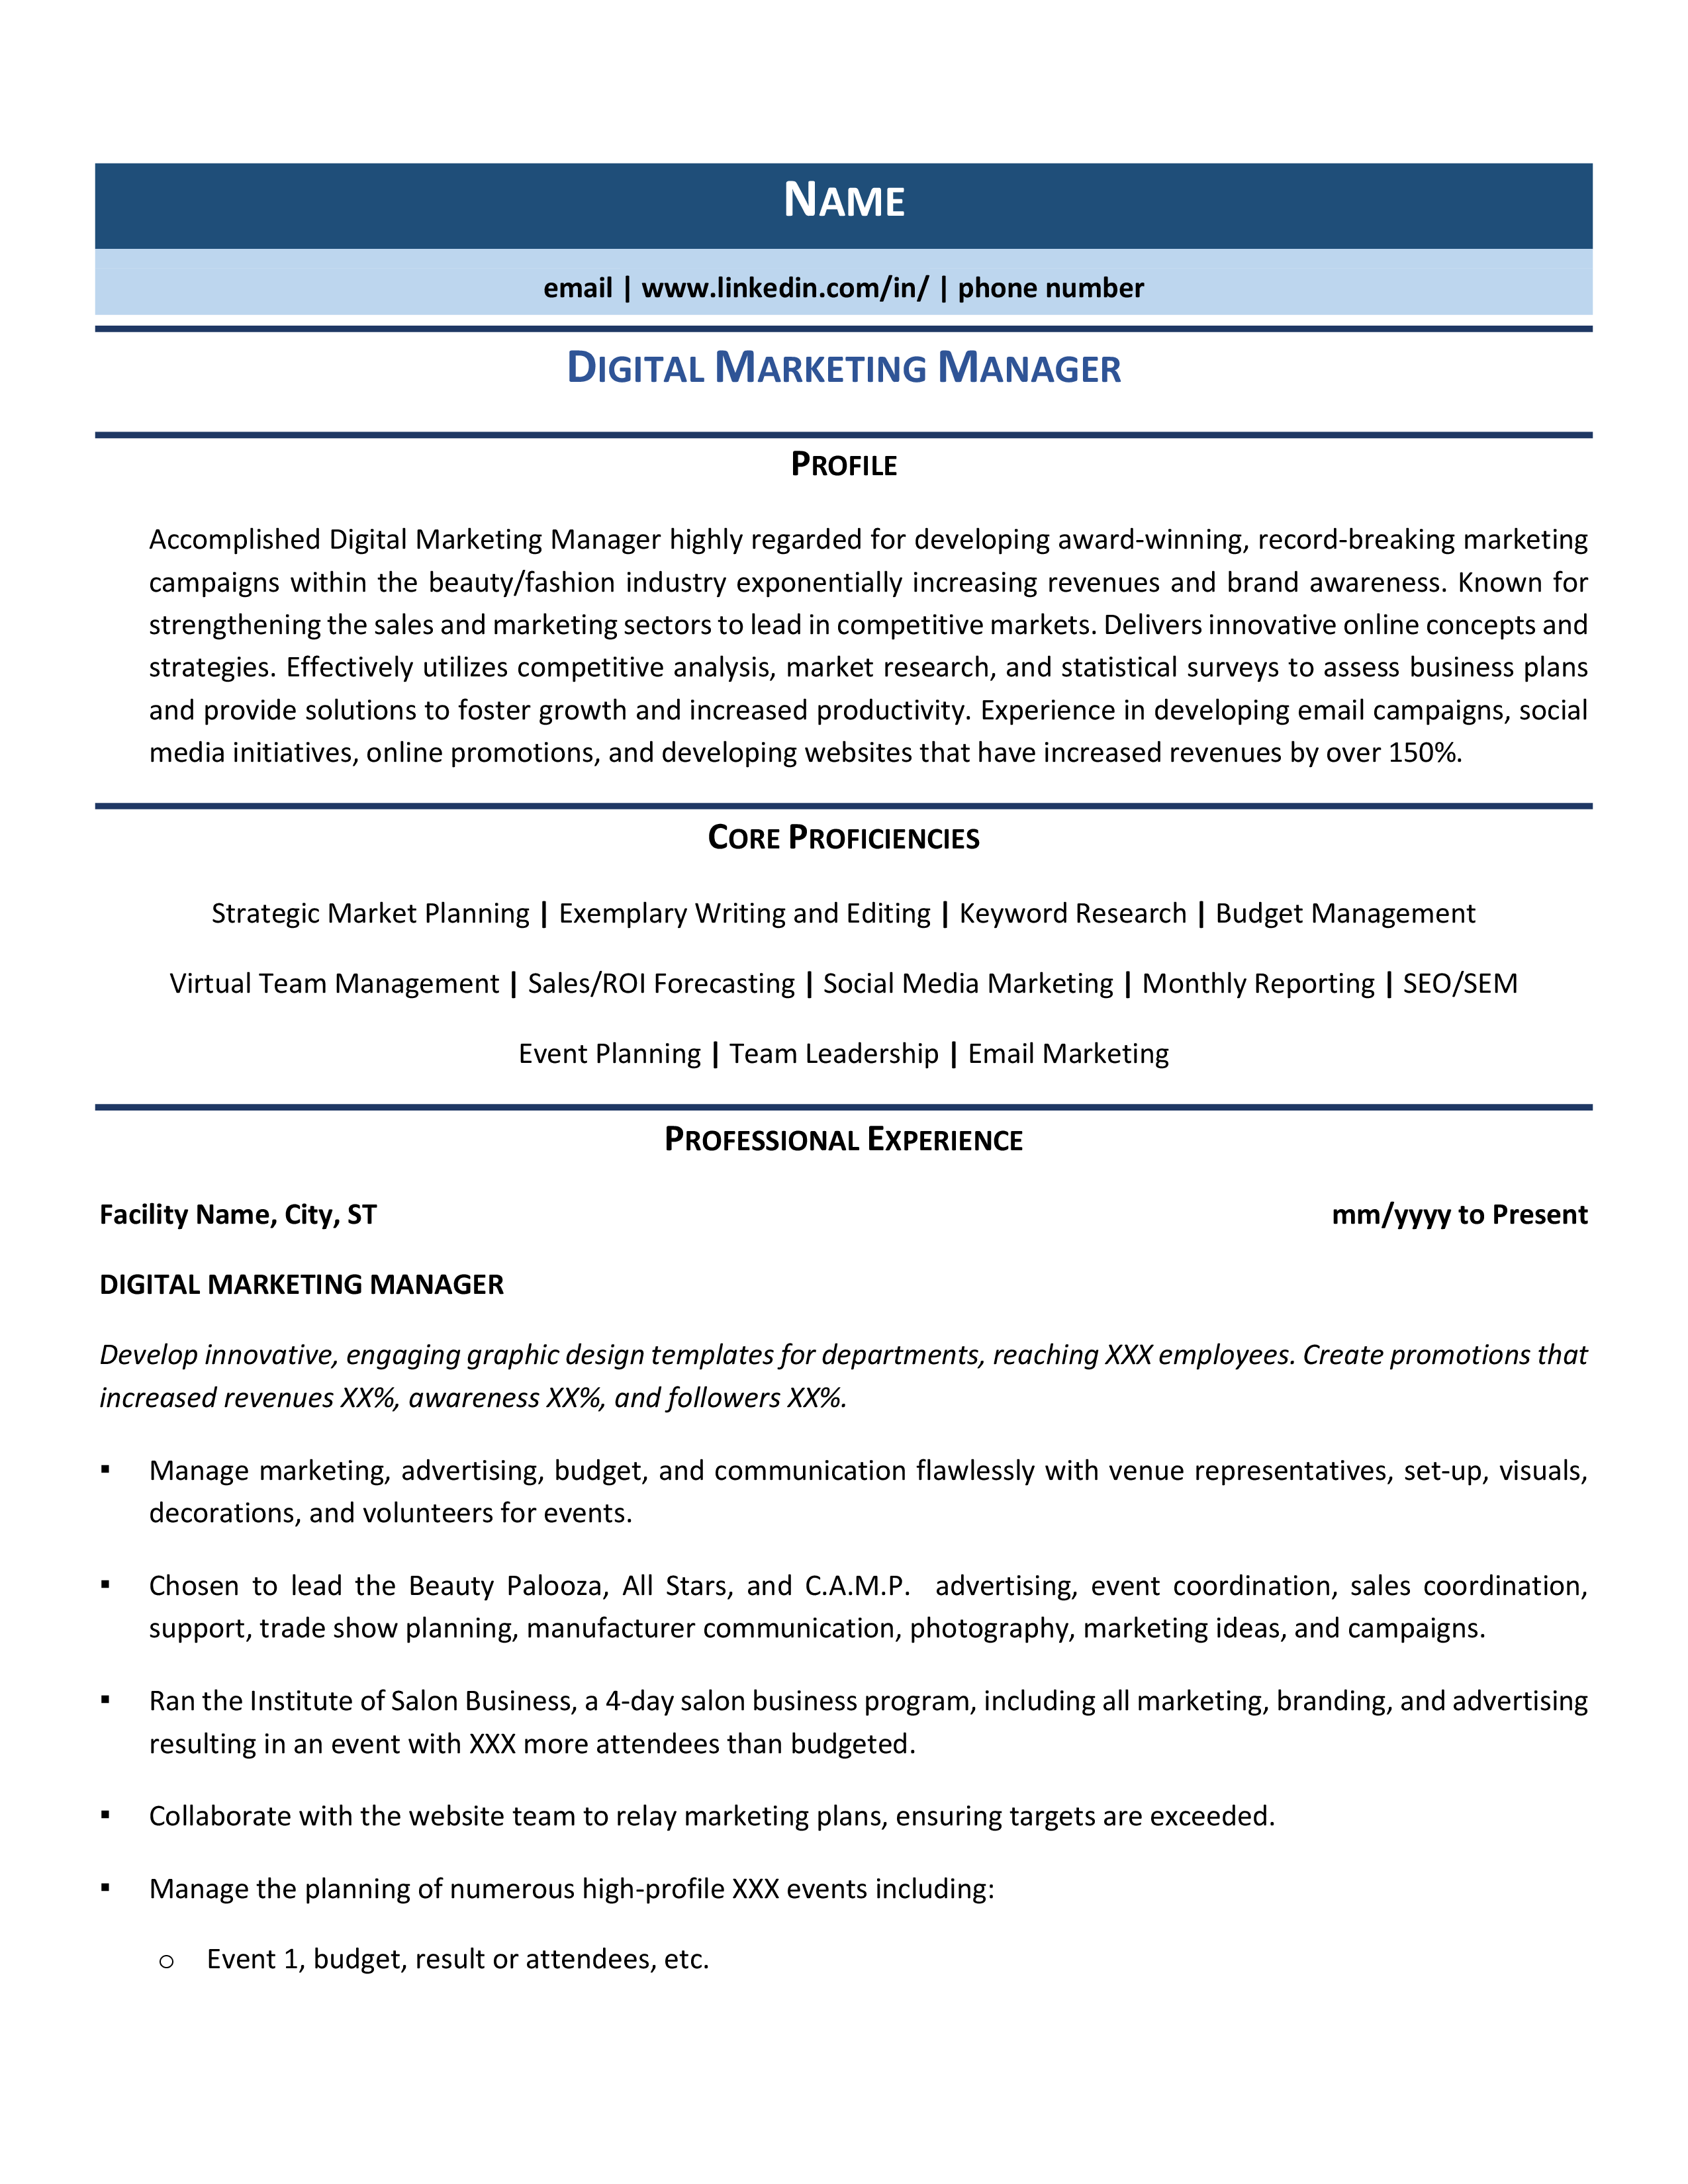 Digital Marketing Manager Resume Samples Template Guide Digital Marketing Manager Manager Resume Digital Marketing